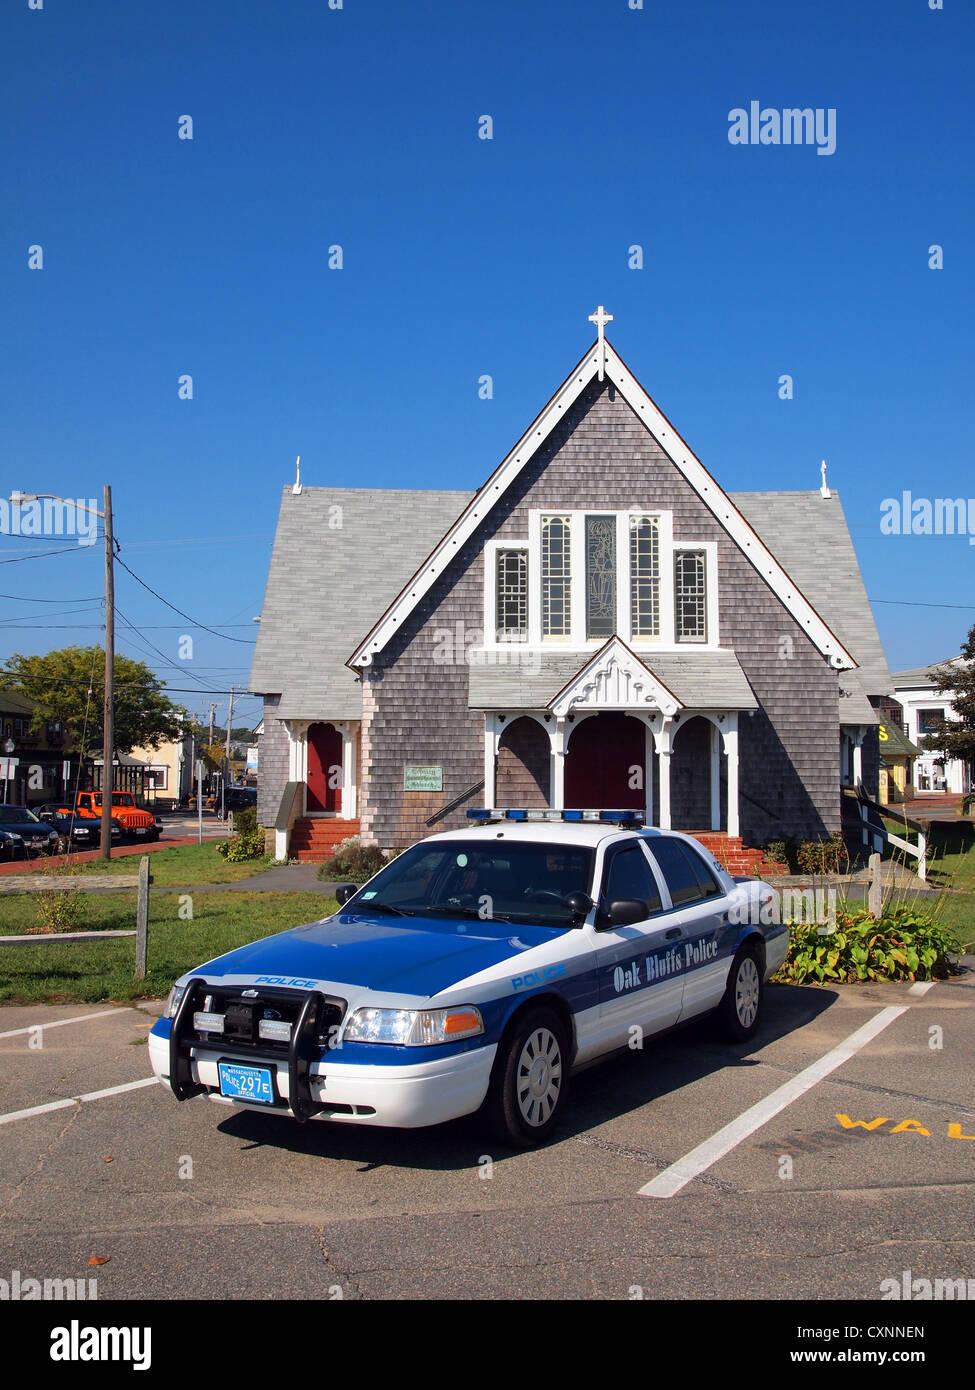 Oak Bluffs Police car, Oak Bluffs, Martha's Vineyard, Massachusetts, USA - Stock Image